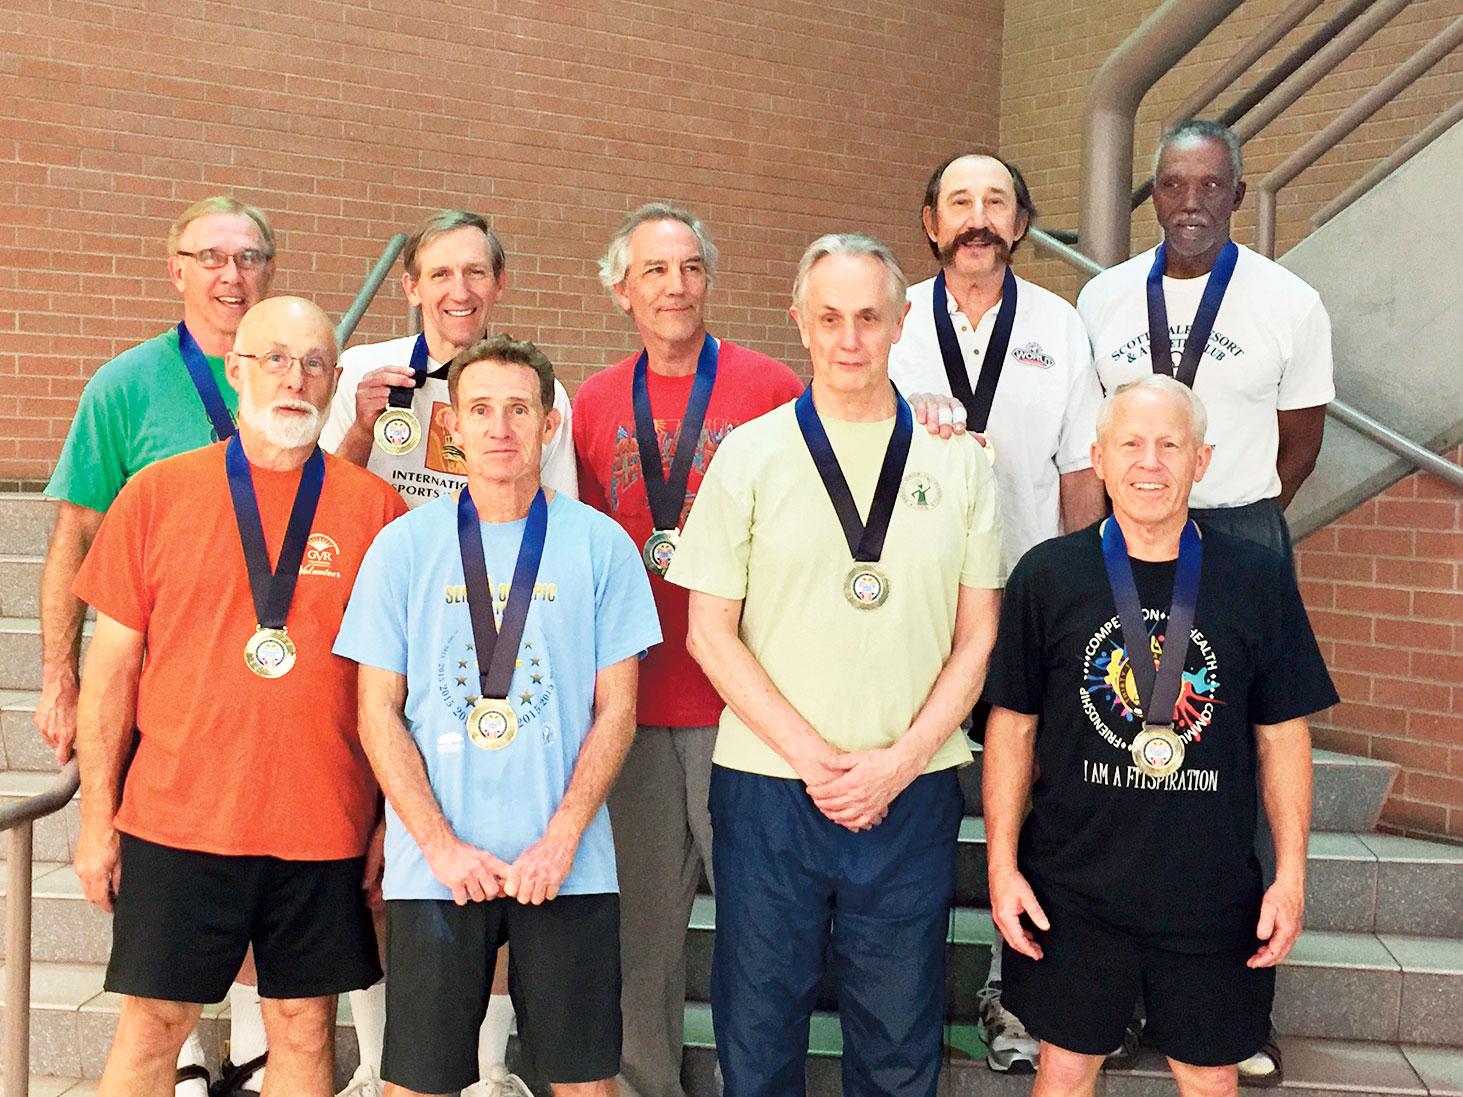 Don Williams, back row, left, with his Desert Thunder team at the Arizona Senior Olympics Gold Medal presentation